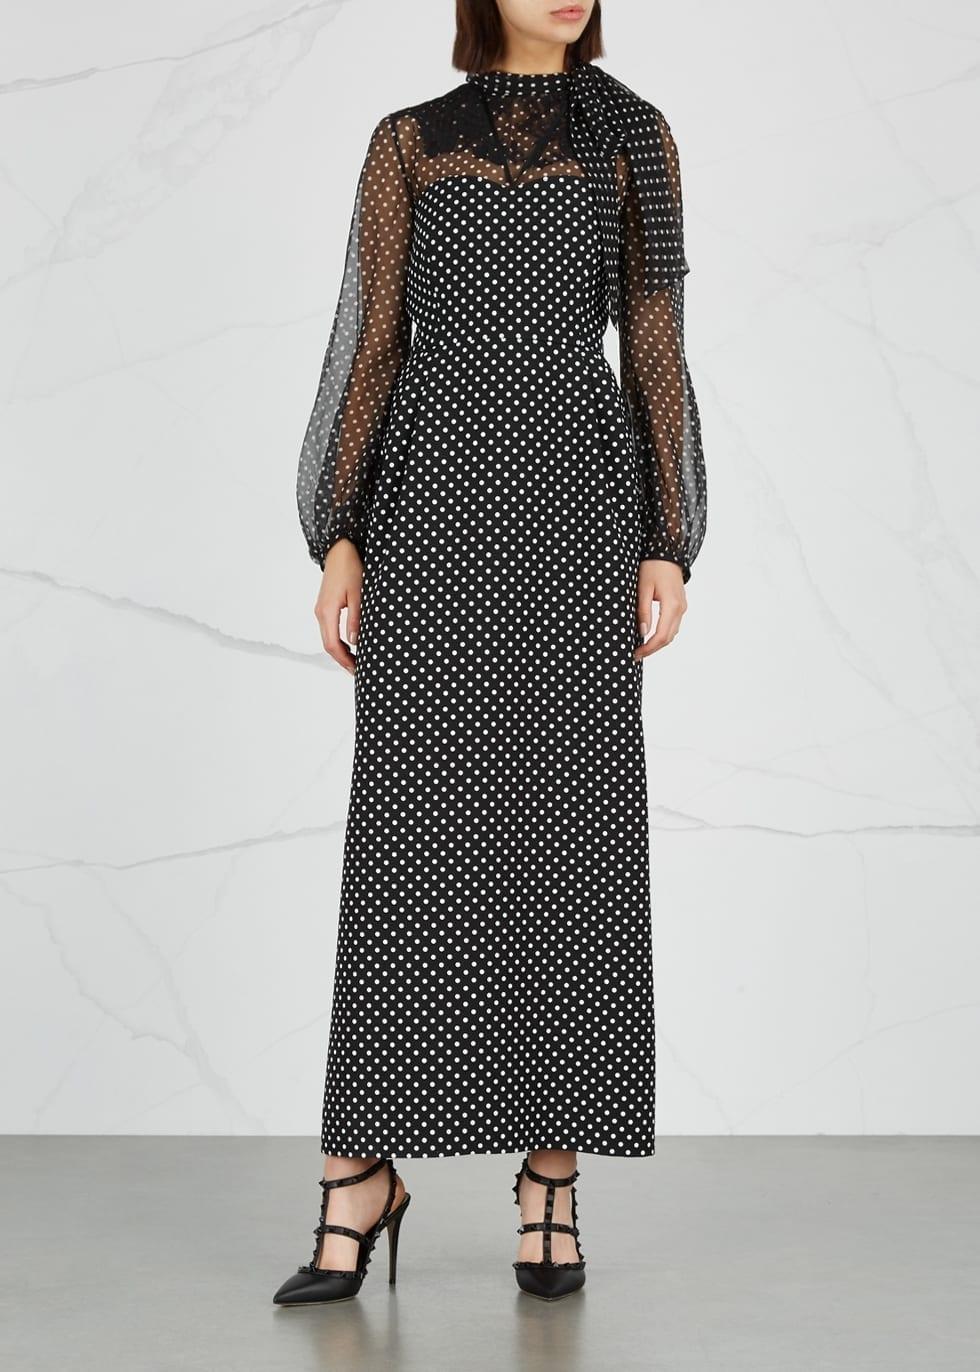 VALENTINO Polka Dot Chiffon And Wool Blend Black Dress